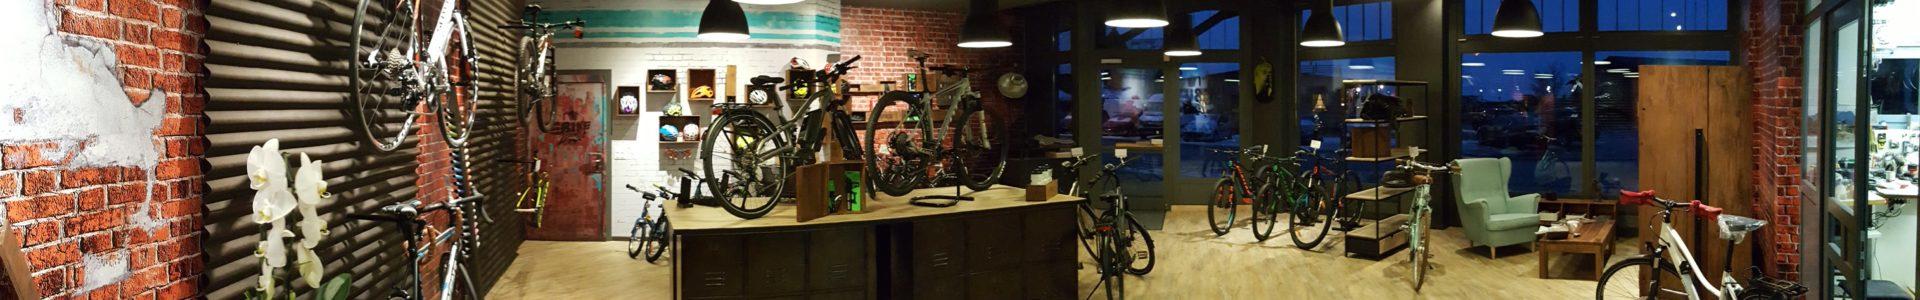 Bike-Lounge by Reto Wiesmann